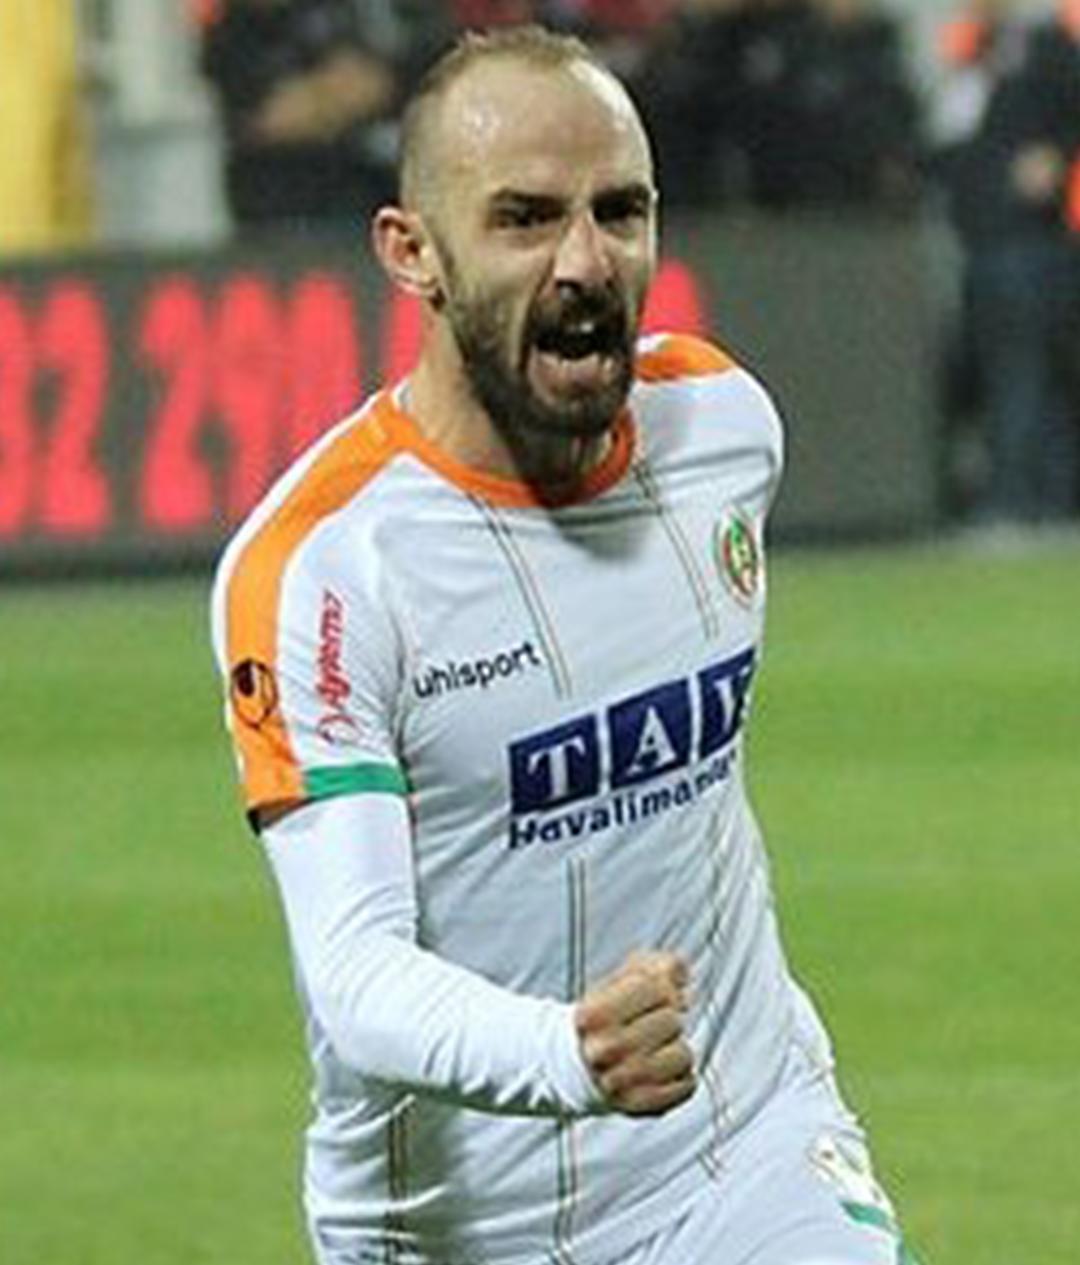 Efecan Karaca